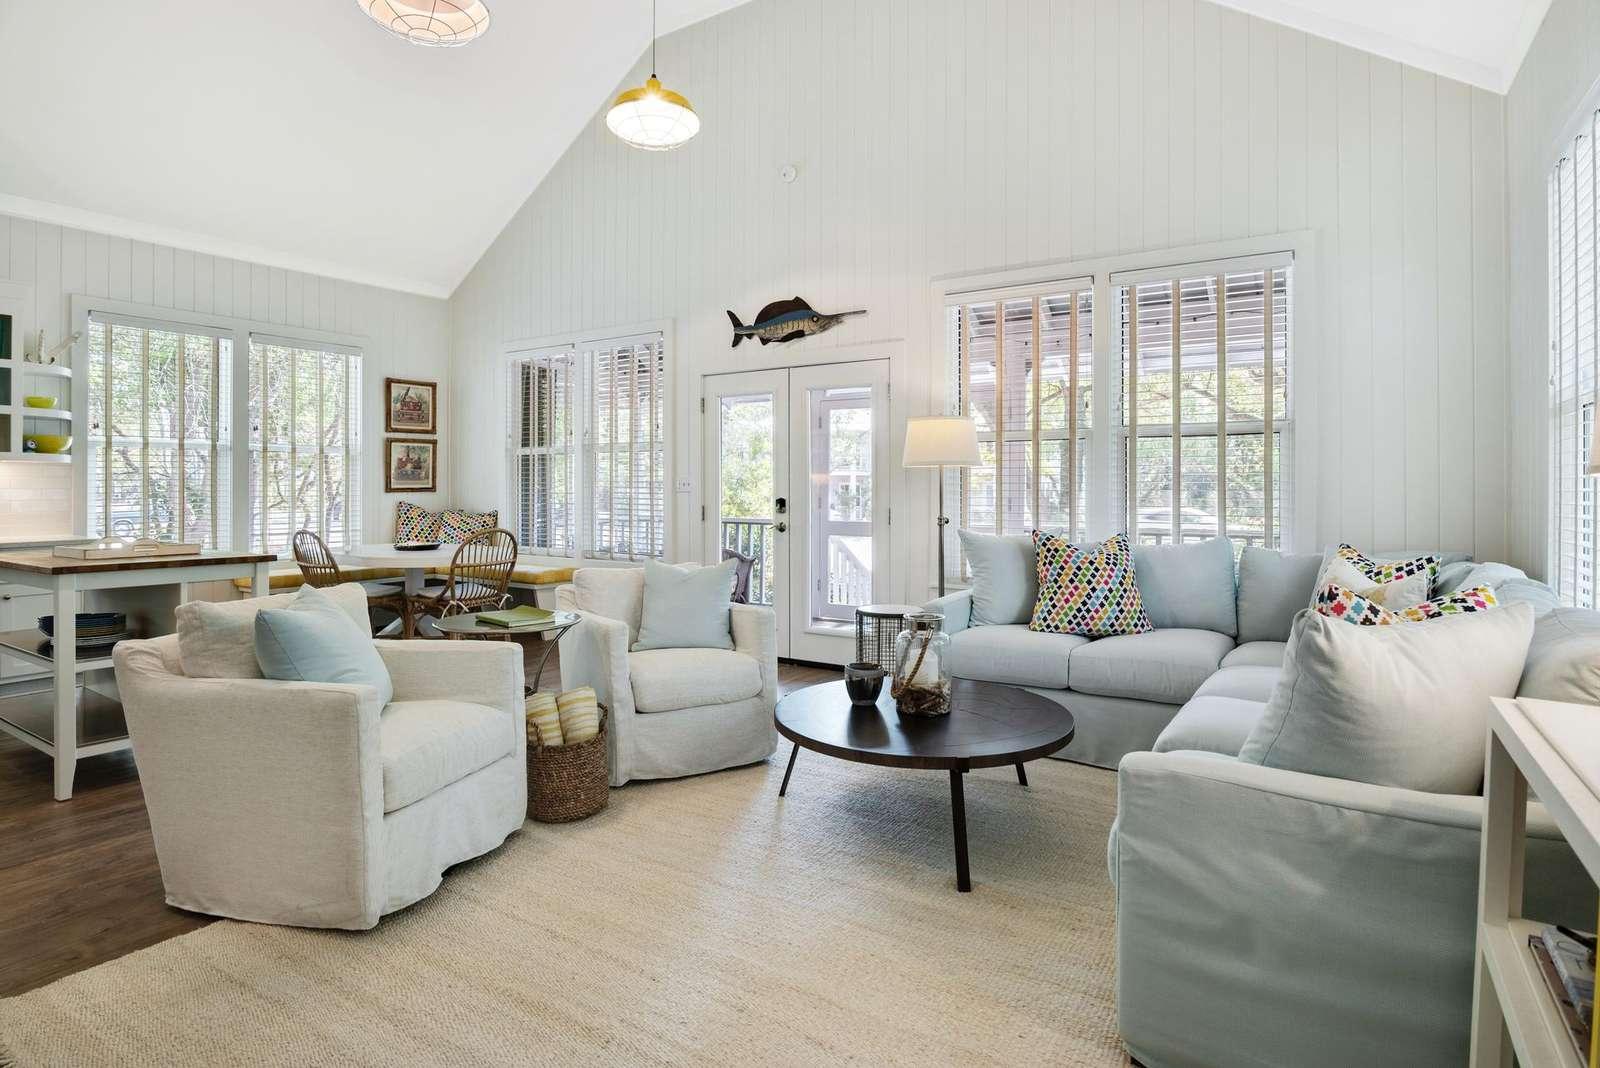 Plenty of Seating in Living Room